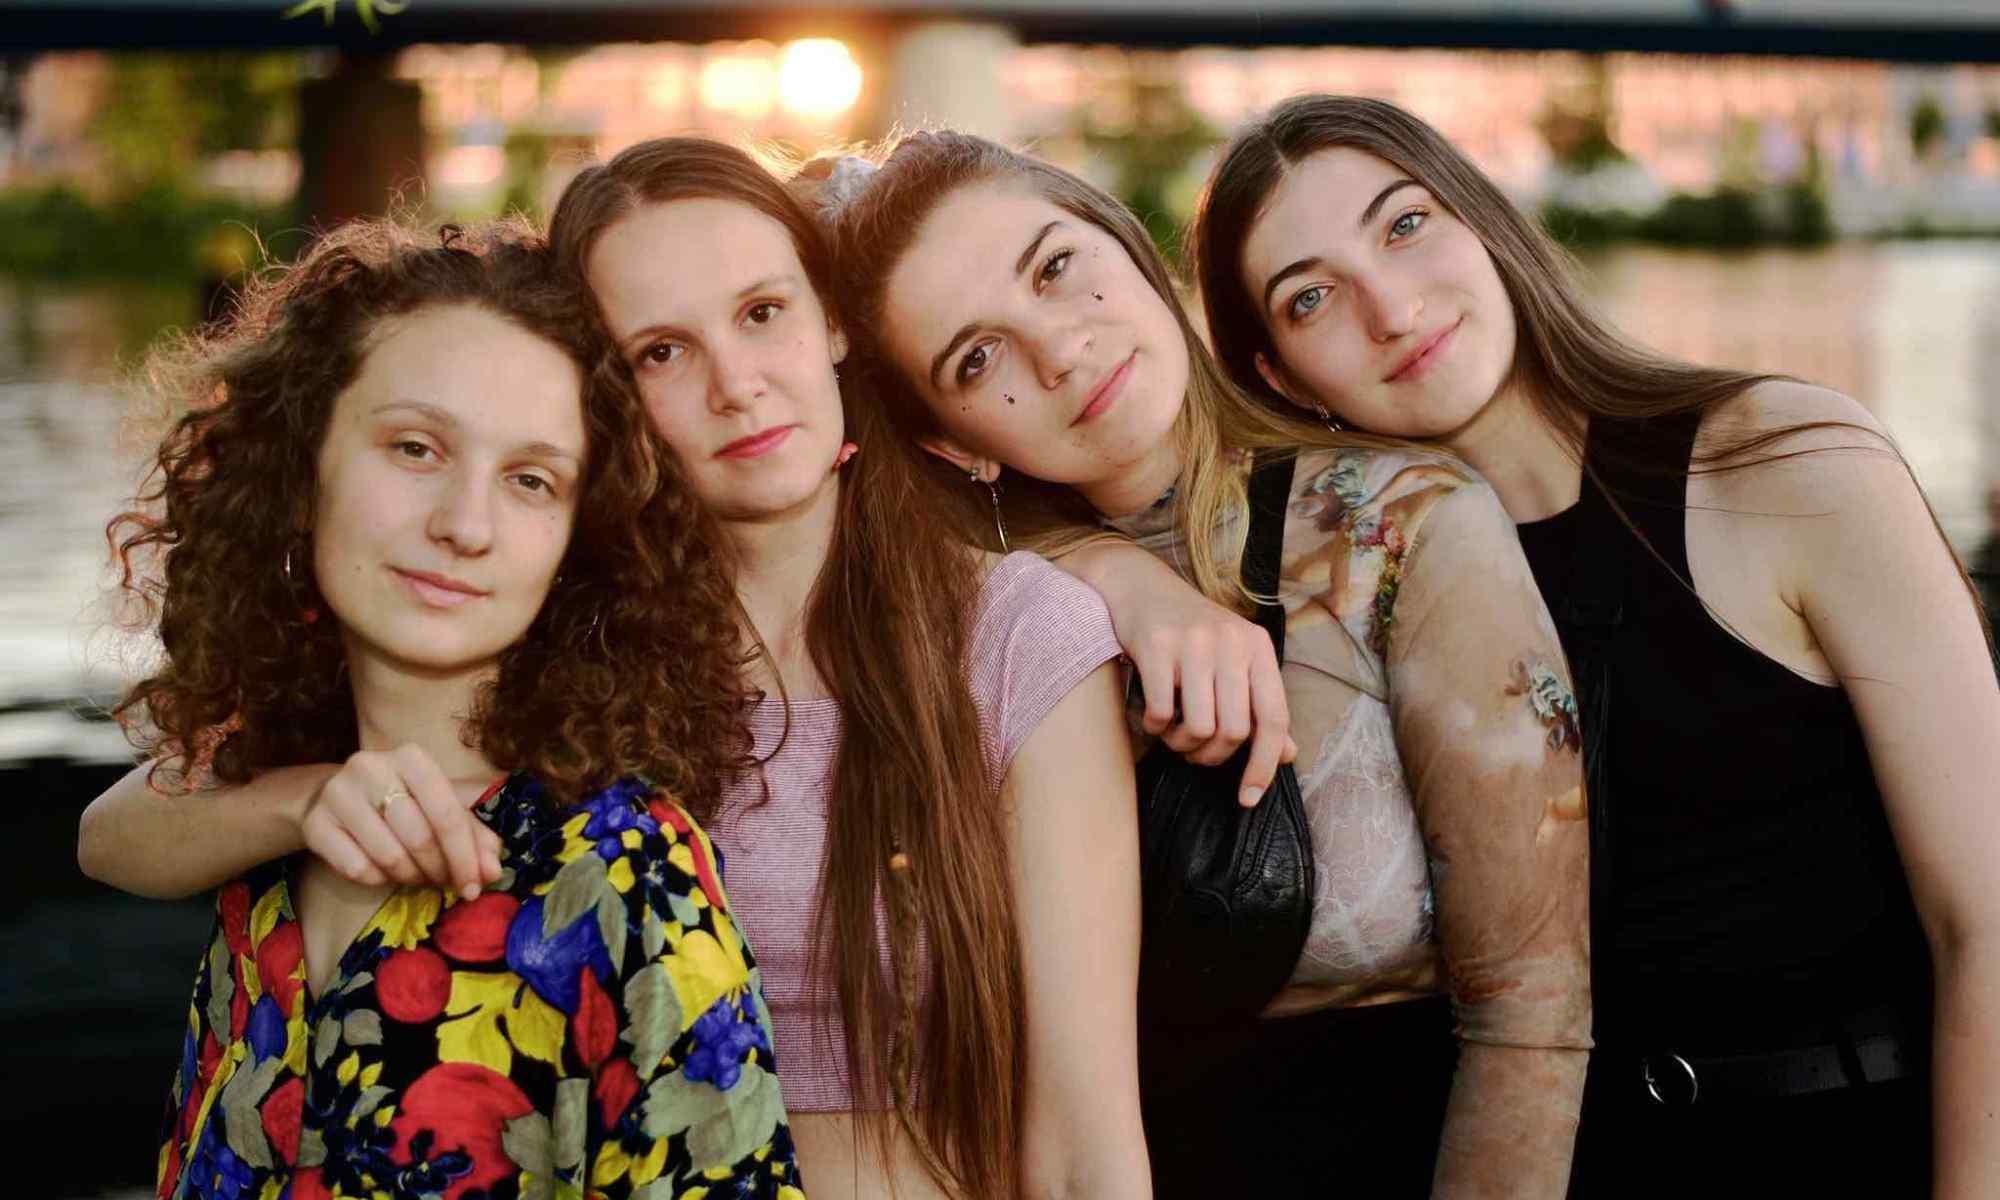 ragazze-sorridono-visi-mani-errichetta-festival